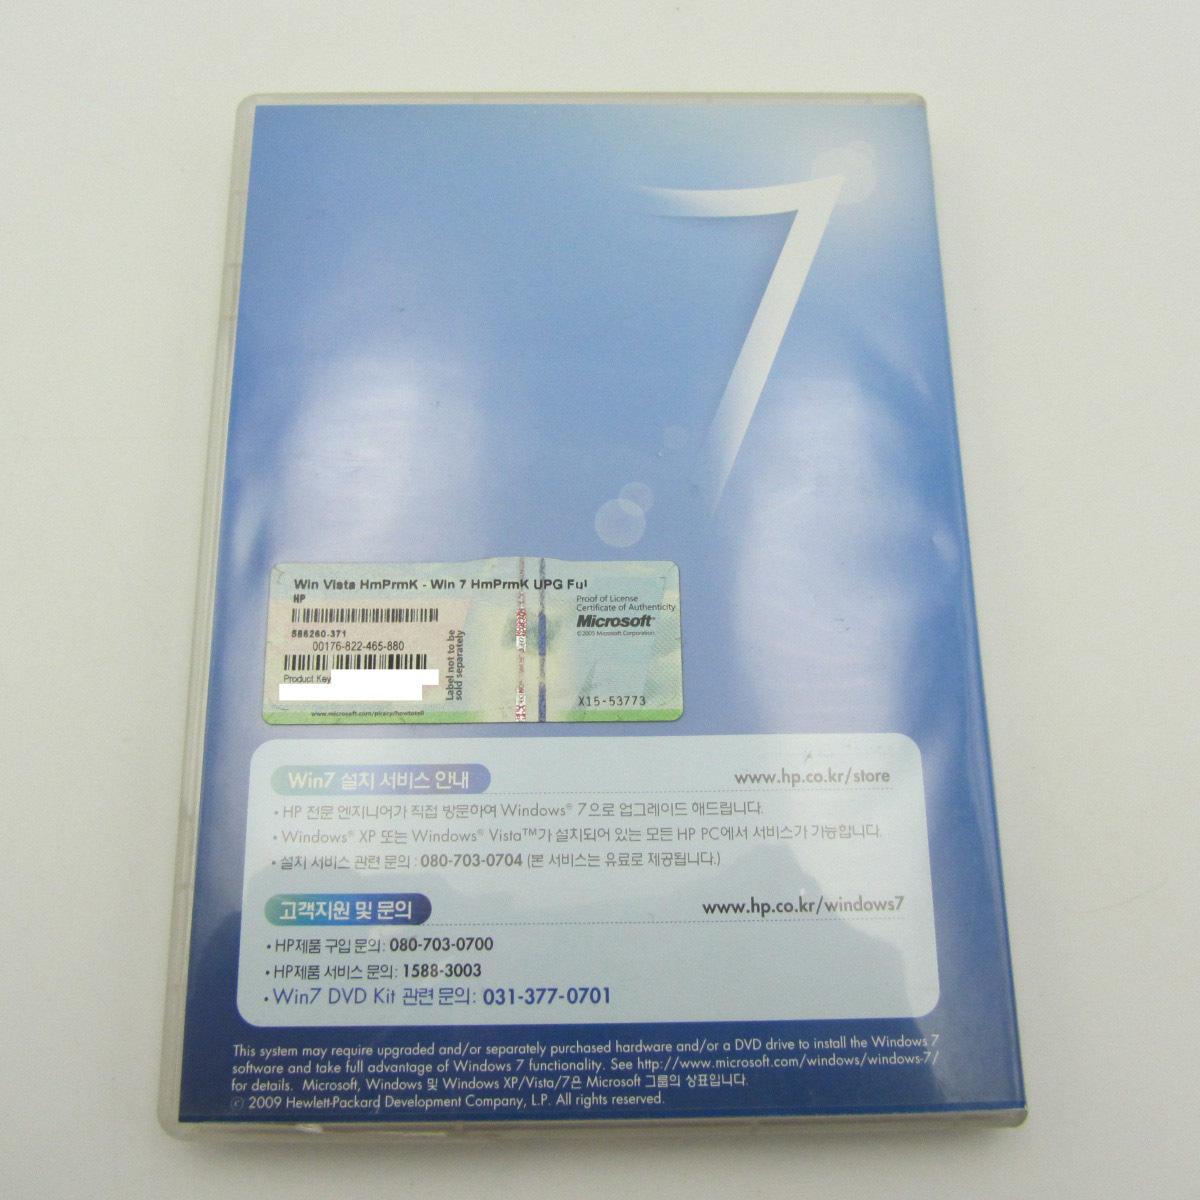 RS264●Windows 7 hp アップグレード用 vista から Windows 7 homepremium/ライセンスキー付き/英語 韓国語版_画像2